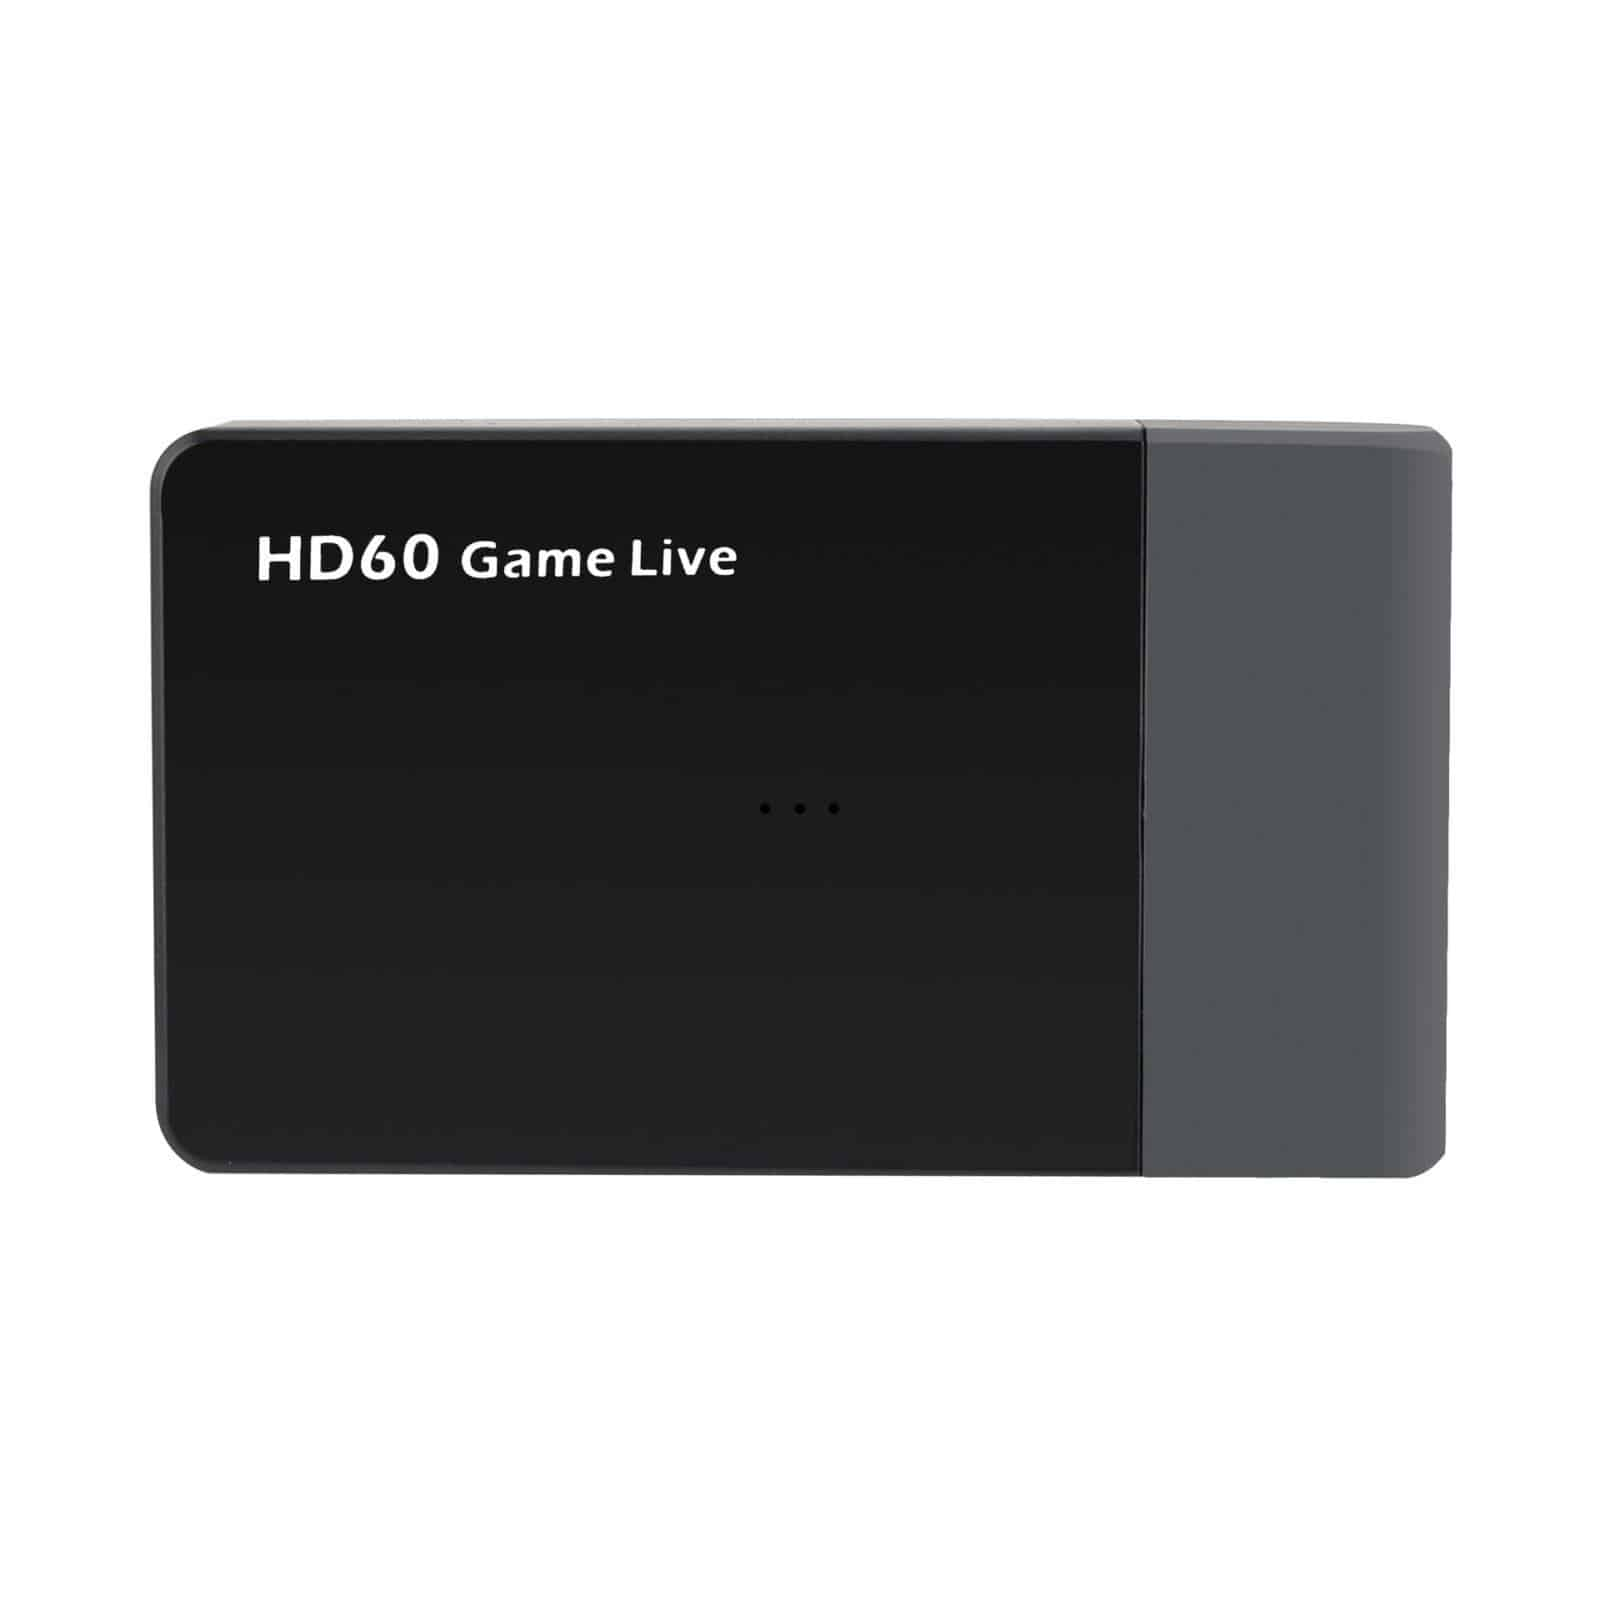 9031162802 869224906 1 - Внешнее устройство видеозахвата (цифровой видеорекордер) Ezcap 261M HD60: запись видео 1080р 60 FPS, USB 3.0, оцифровка видеокассет